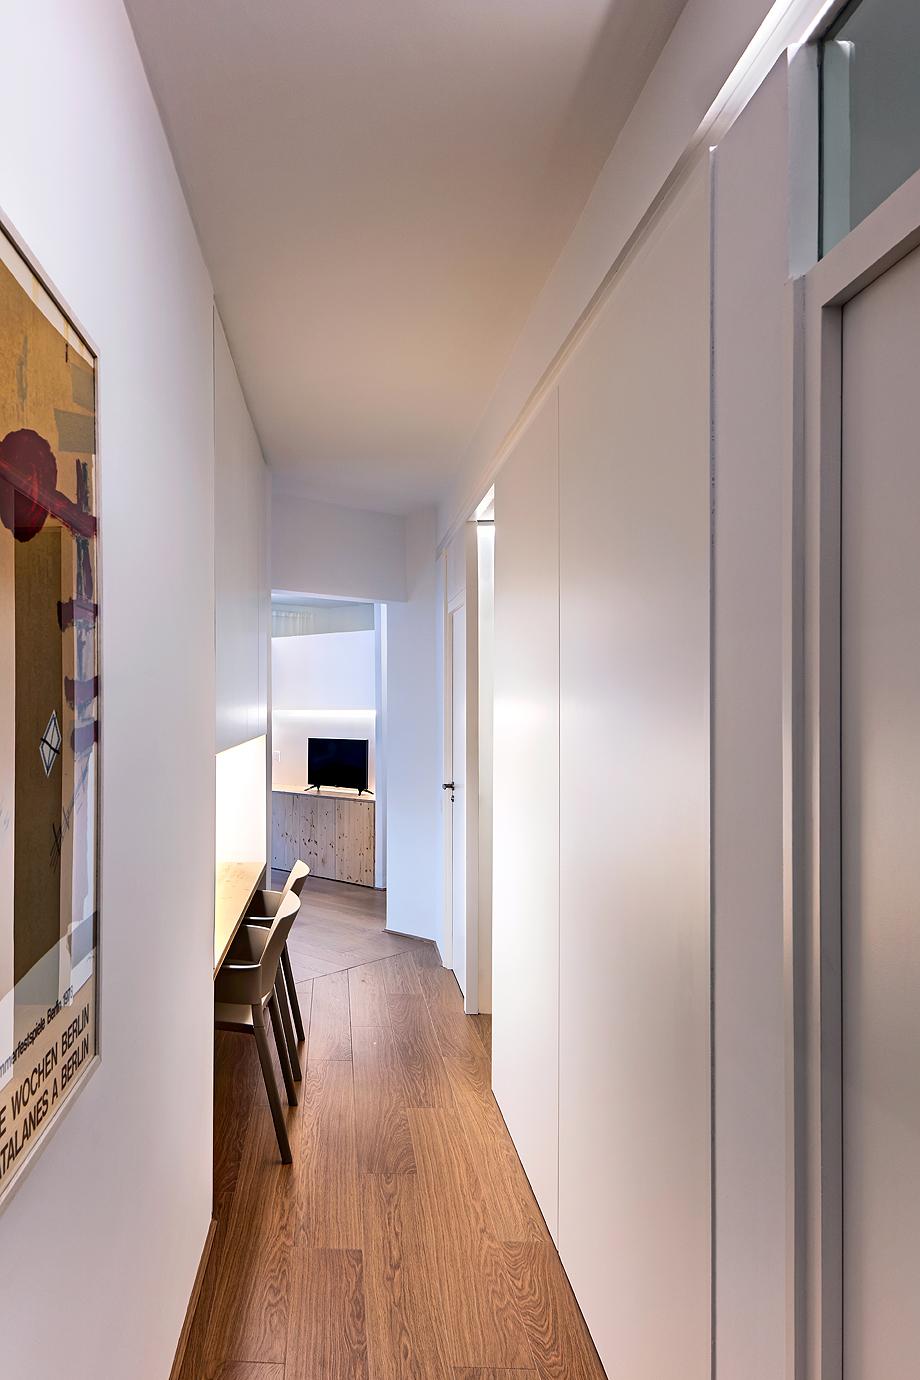 vivienda de alquiler diseño low cost agusti costa (1)